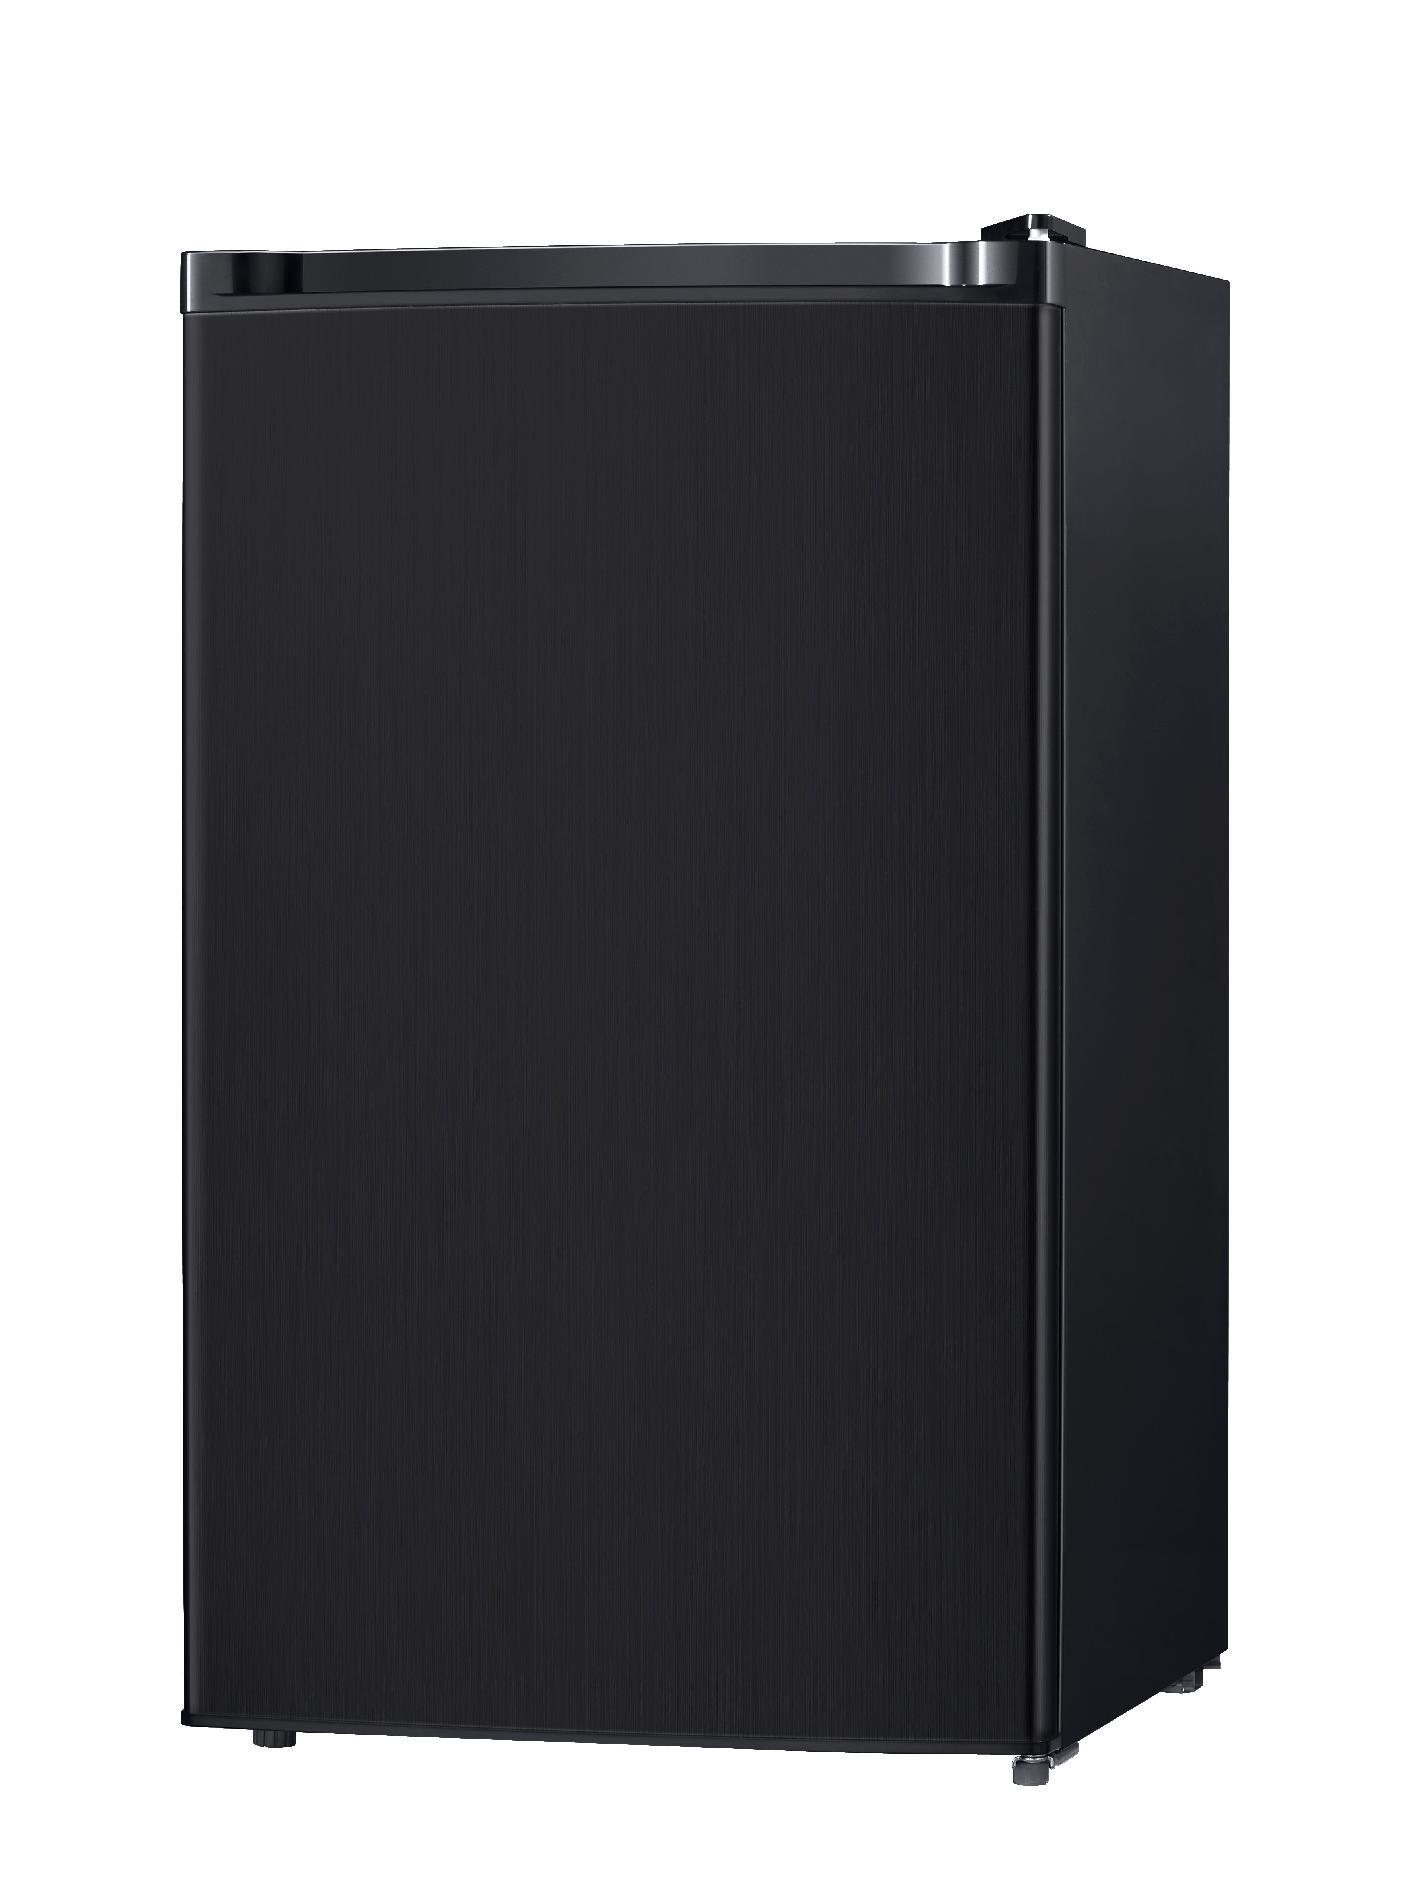 Kenmore 4.4 cu. ft. Compact Refrigerator - Black